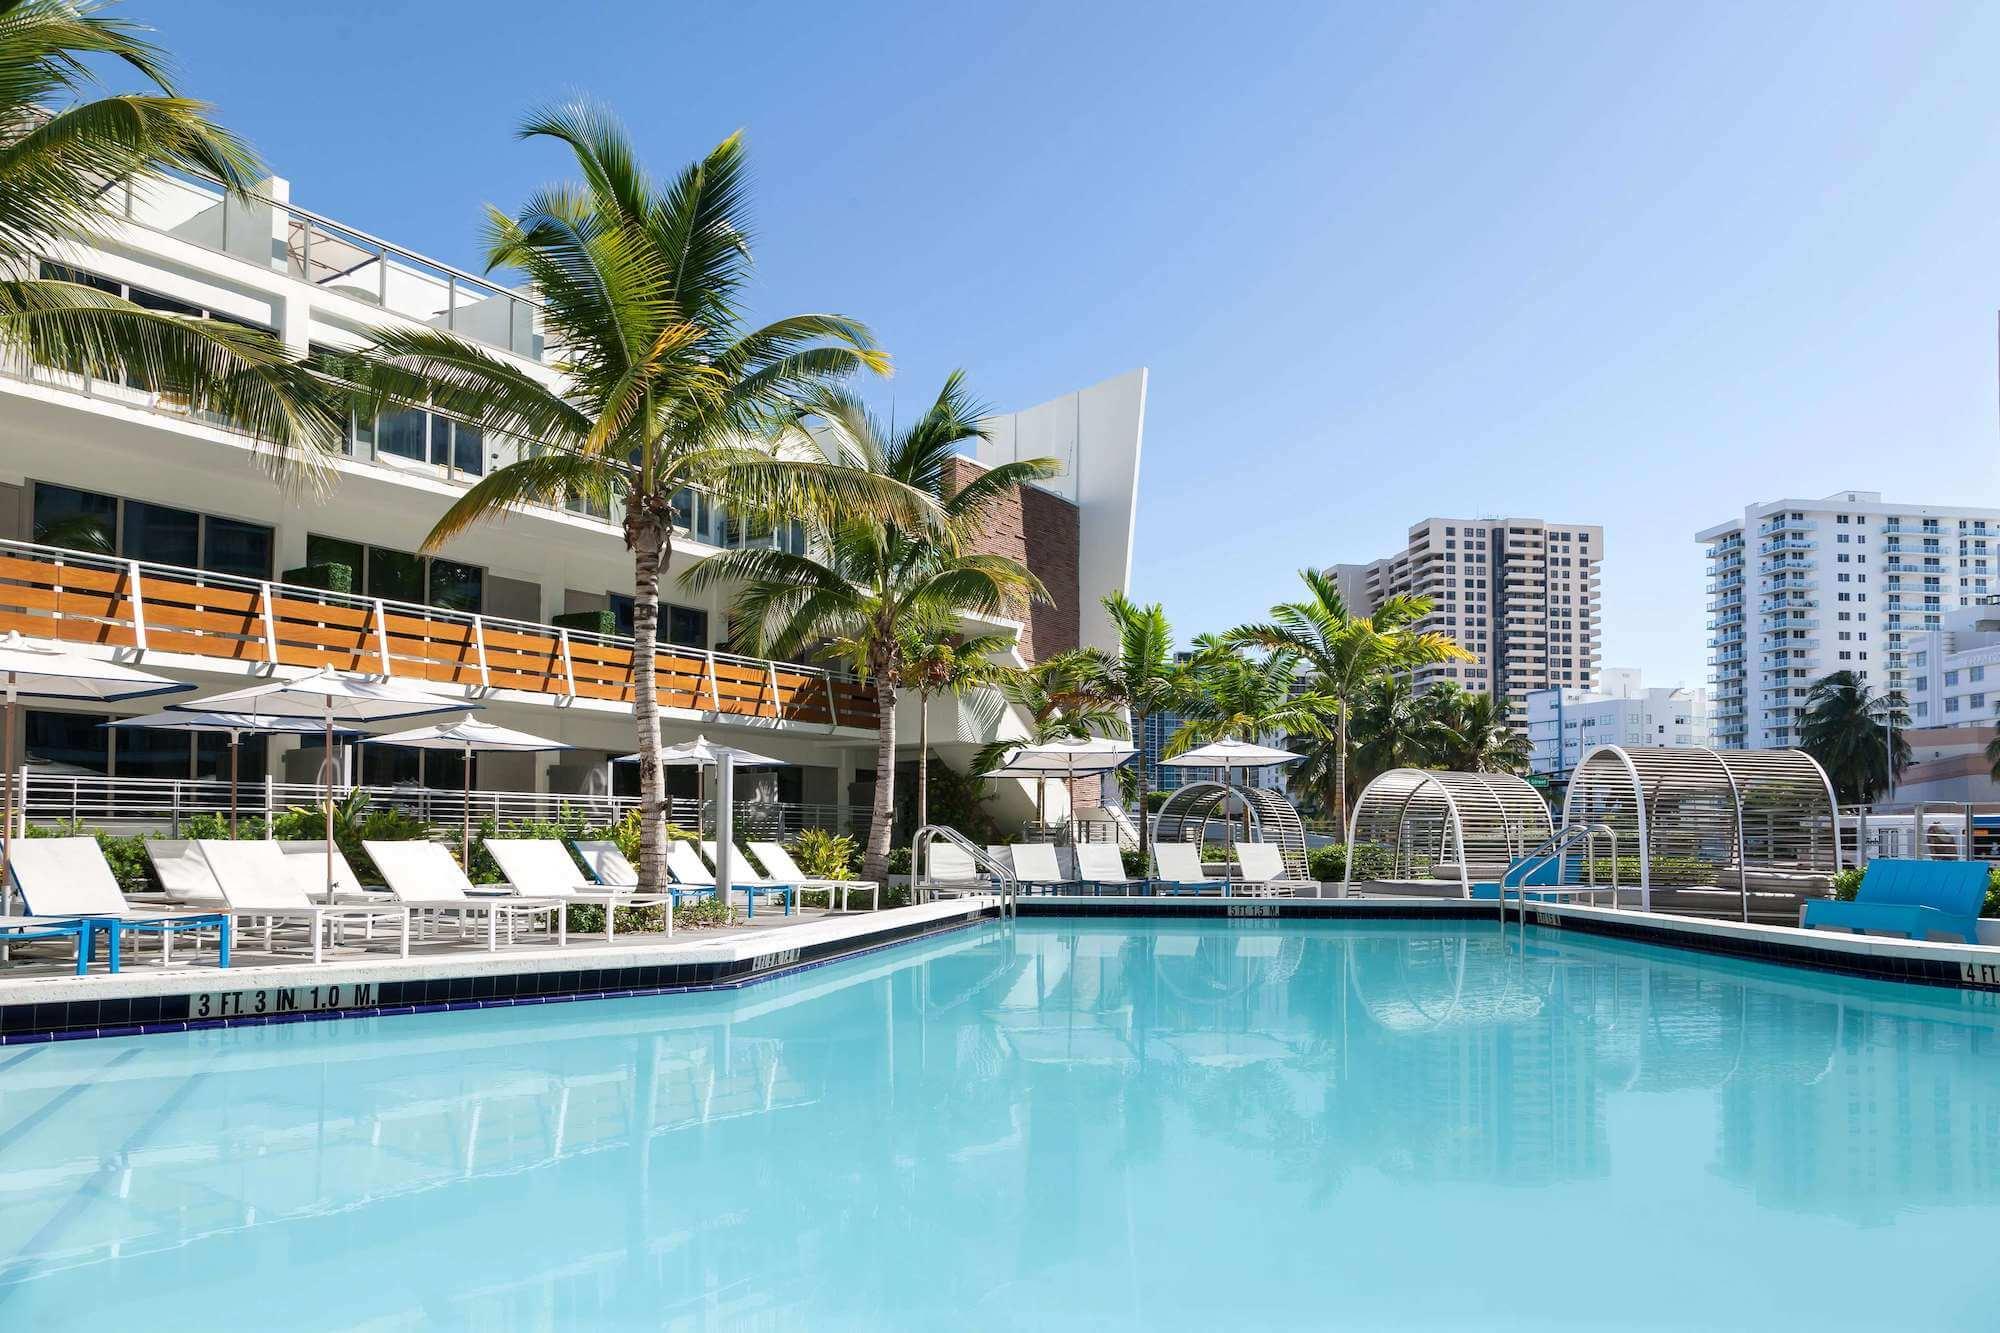 Gates Hotel South Beach Miami